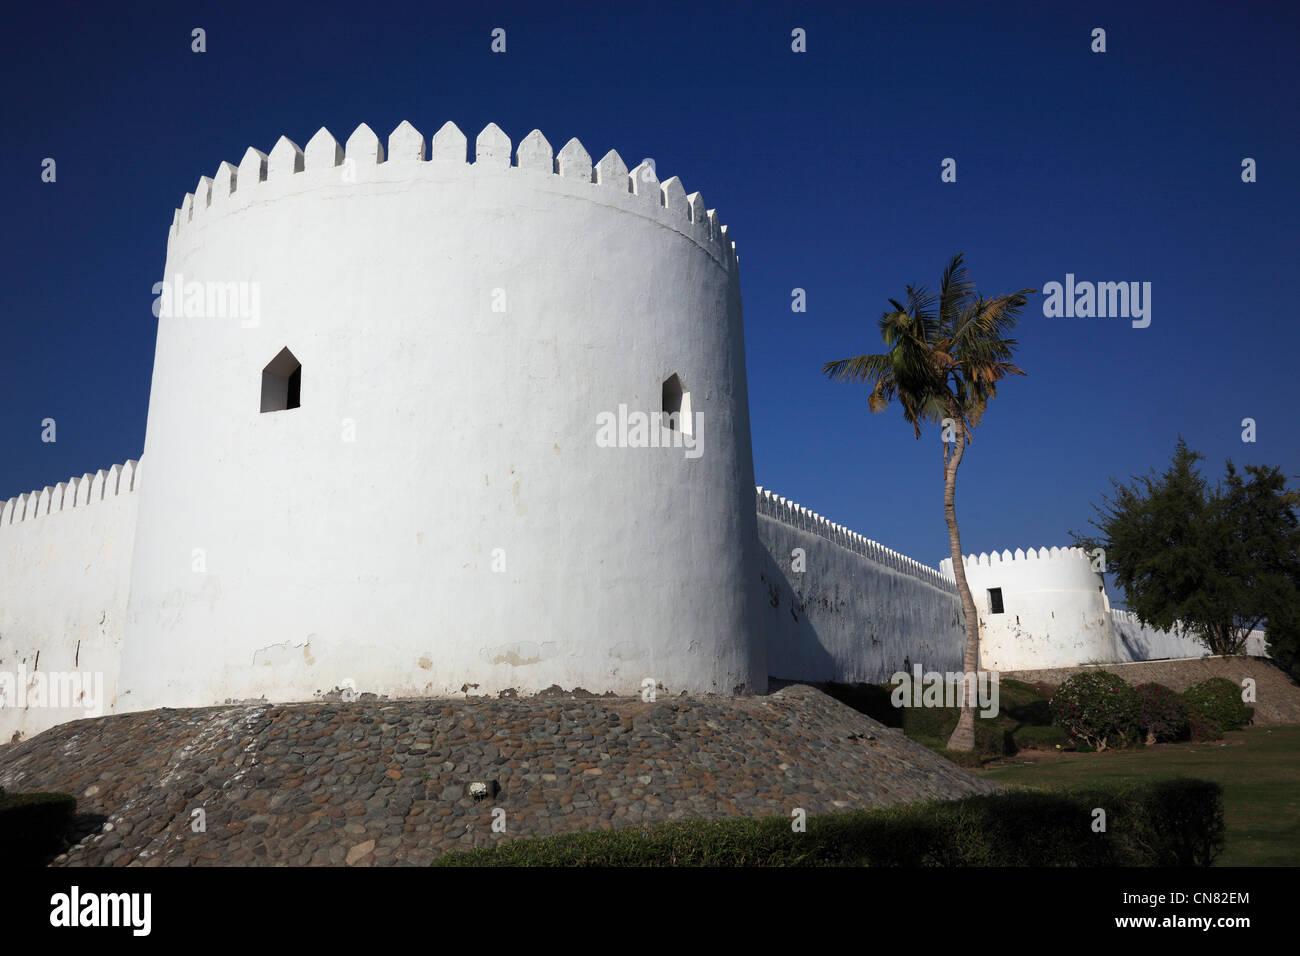 Fort von Sohar, Al Hujra, Oman Stock Photo